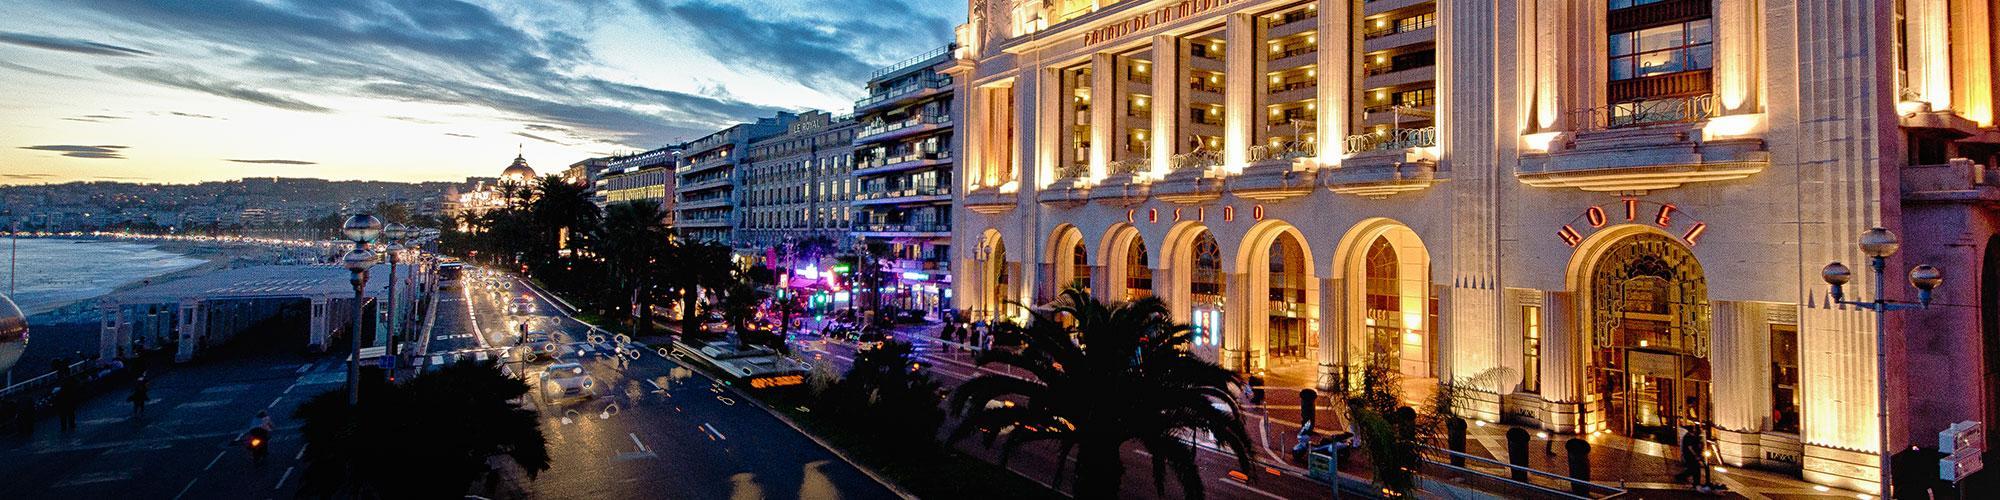 Hyatt Regency Nice Palais de la Méditerranée, France